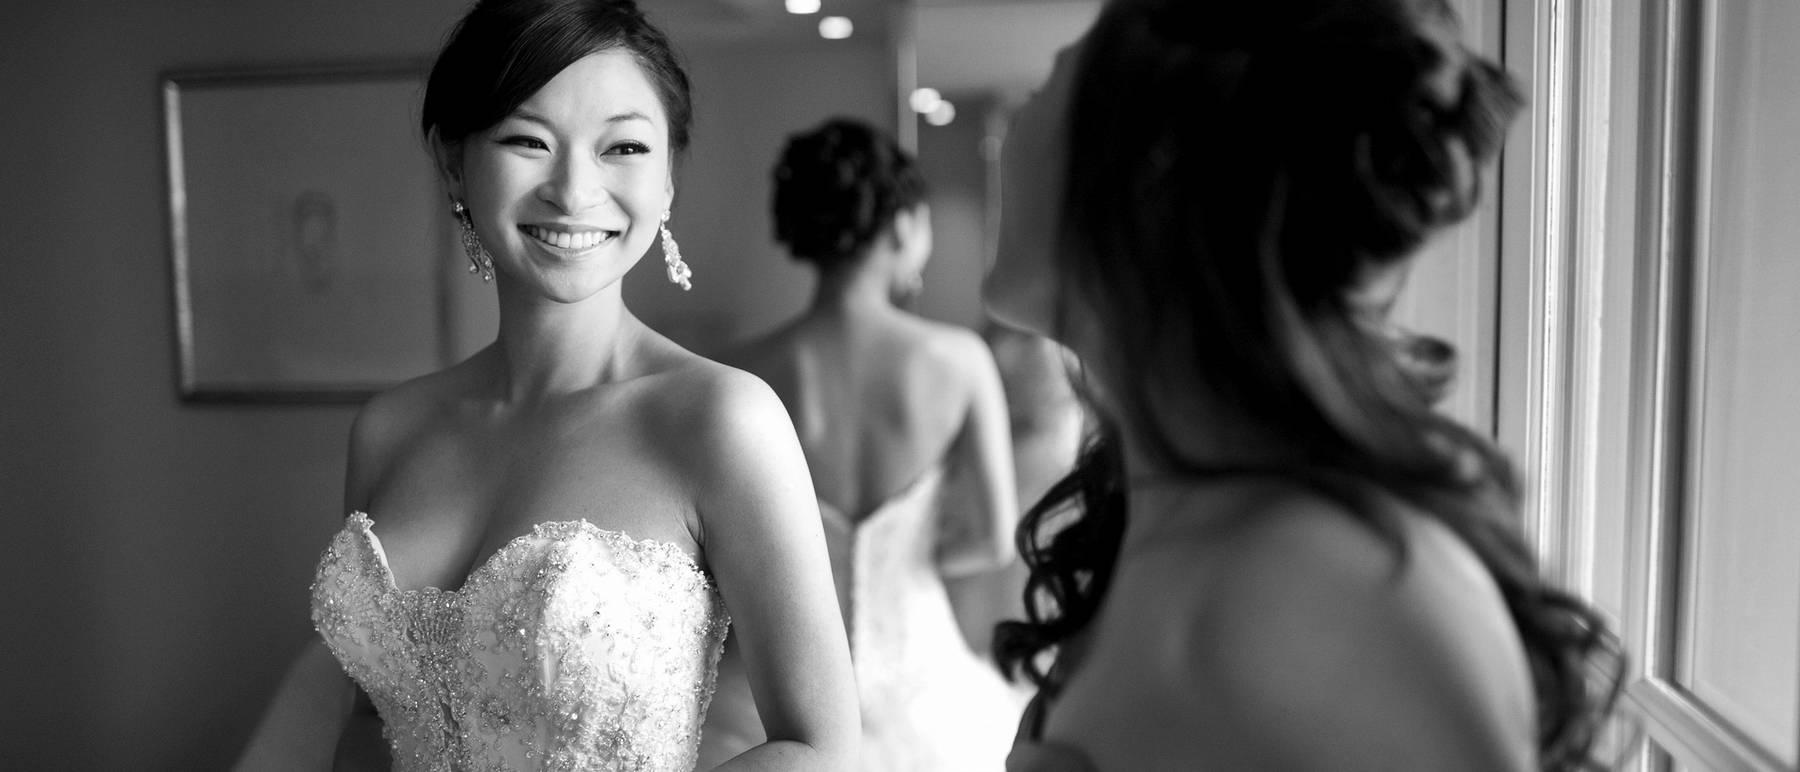 johnandjoseph-wedding-photographer-hz-slider-225